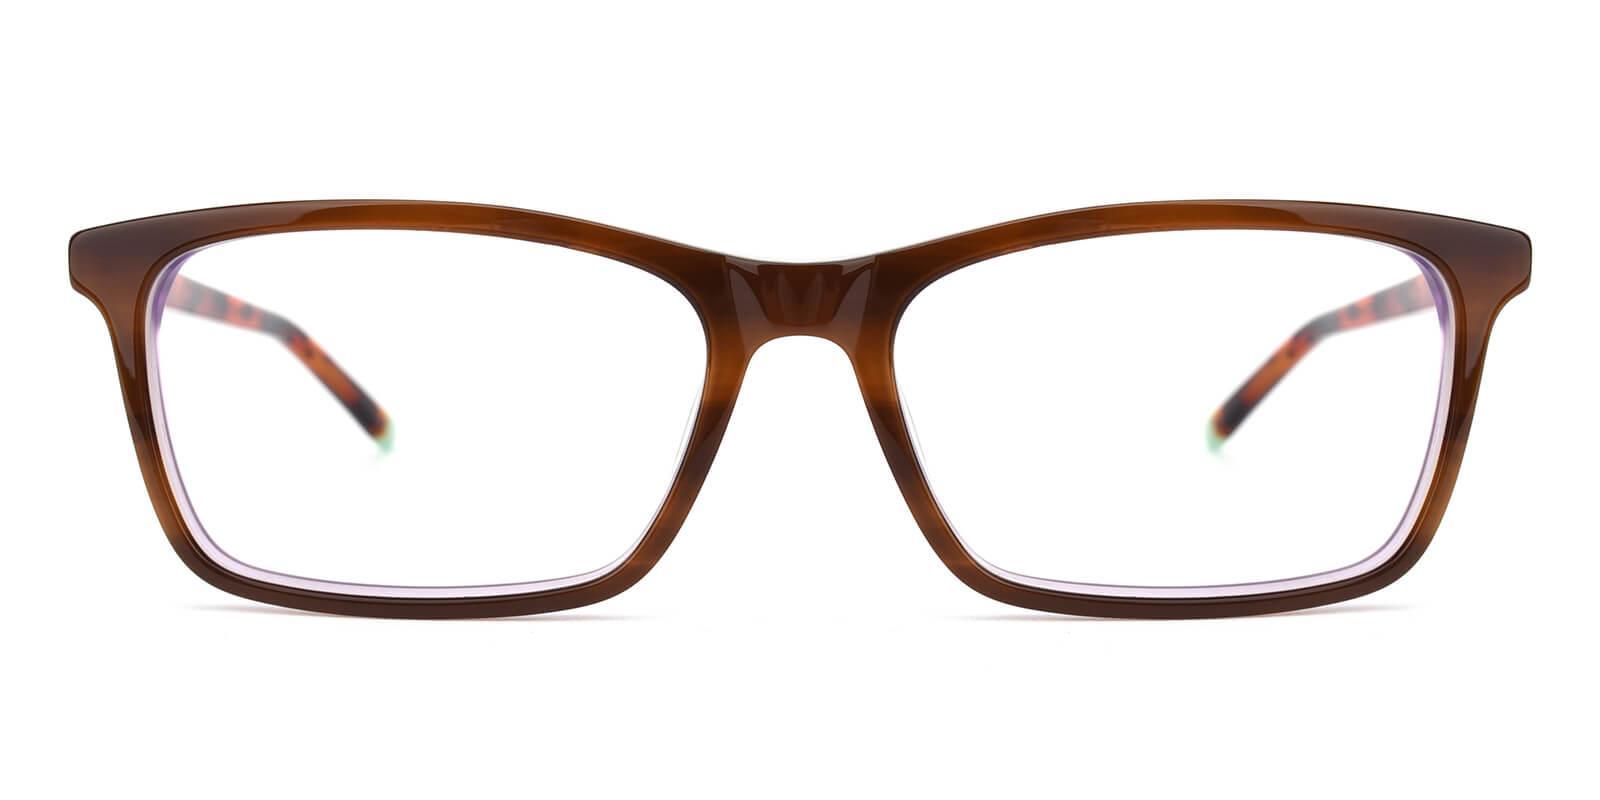 Crane-Tortoise-Rectangle-Acetate-Eyeglasses-additional2